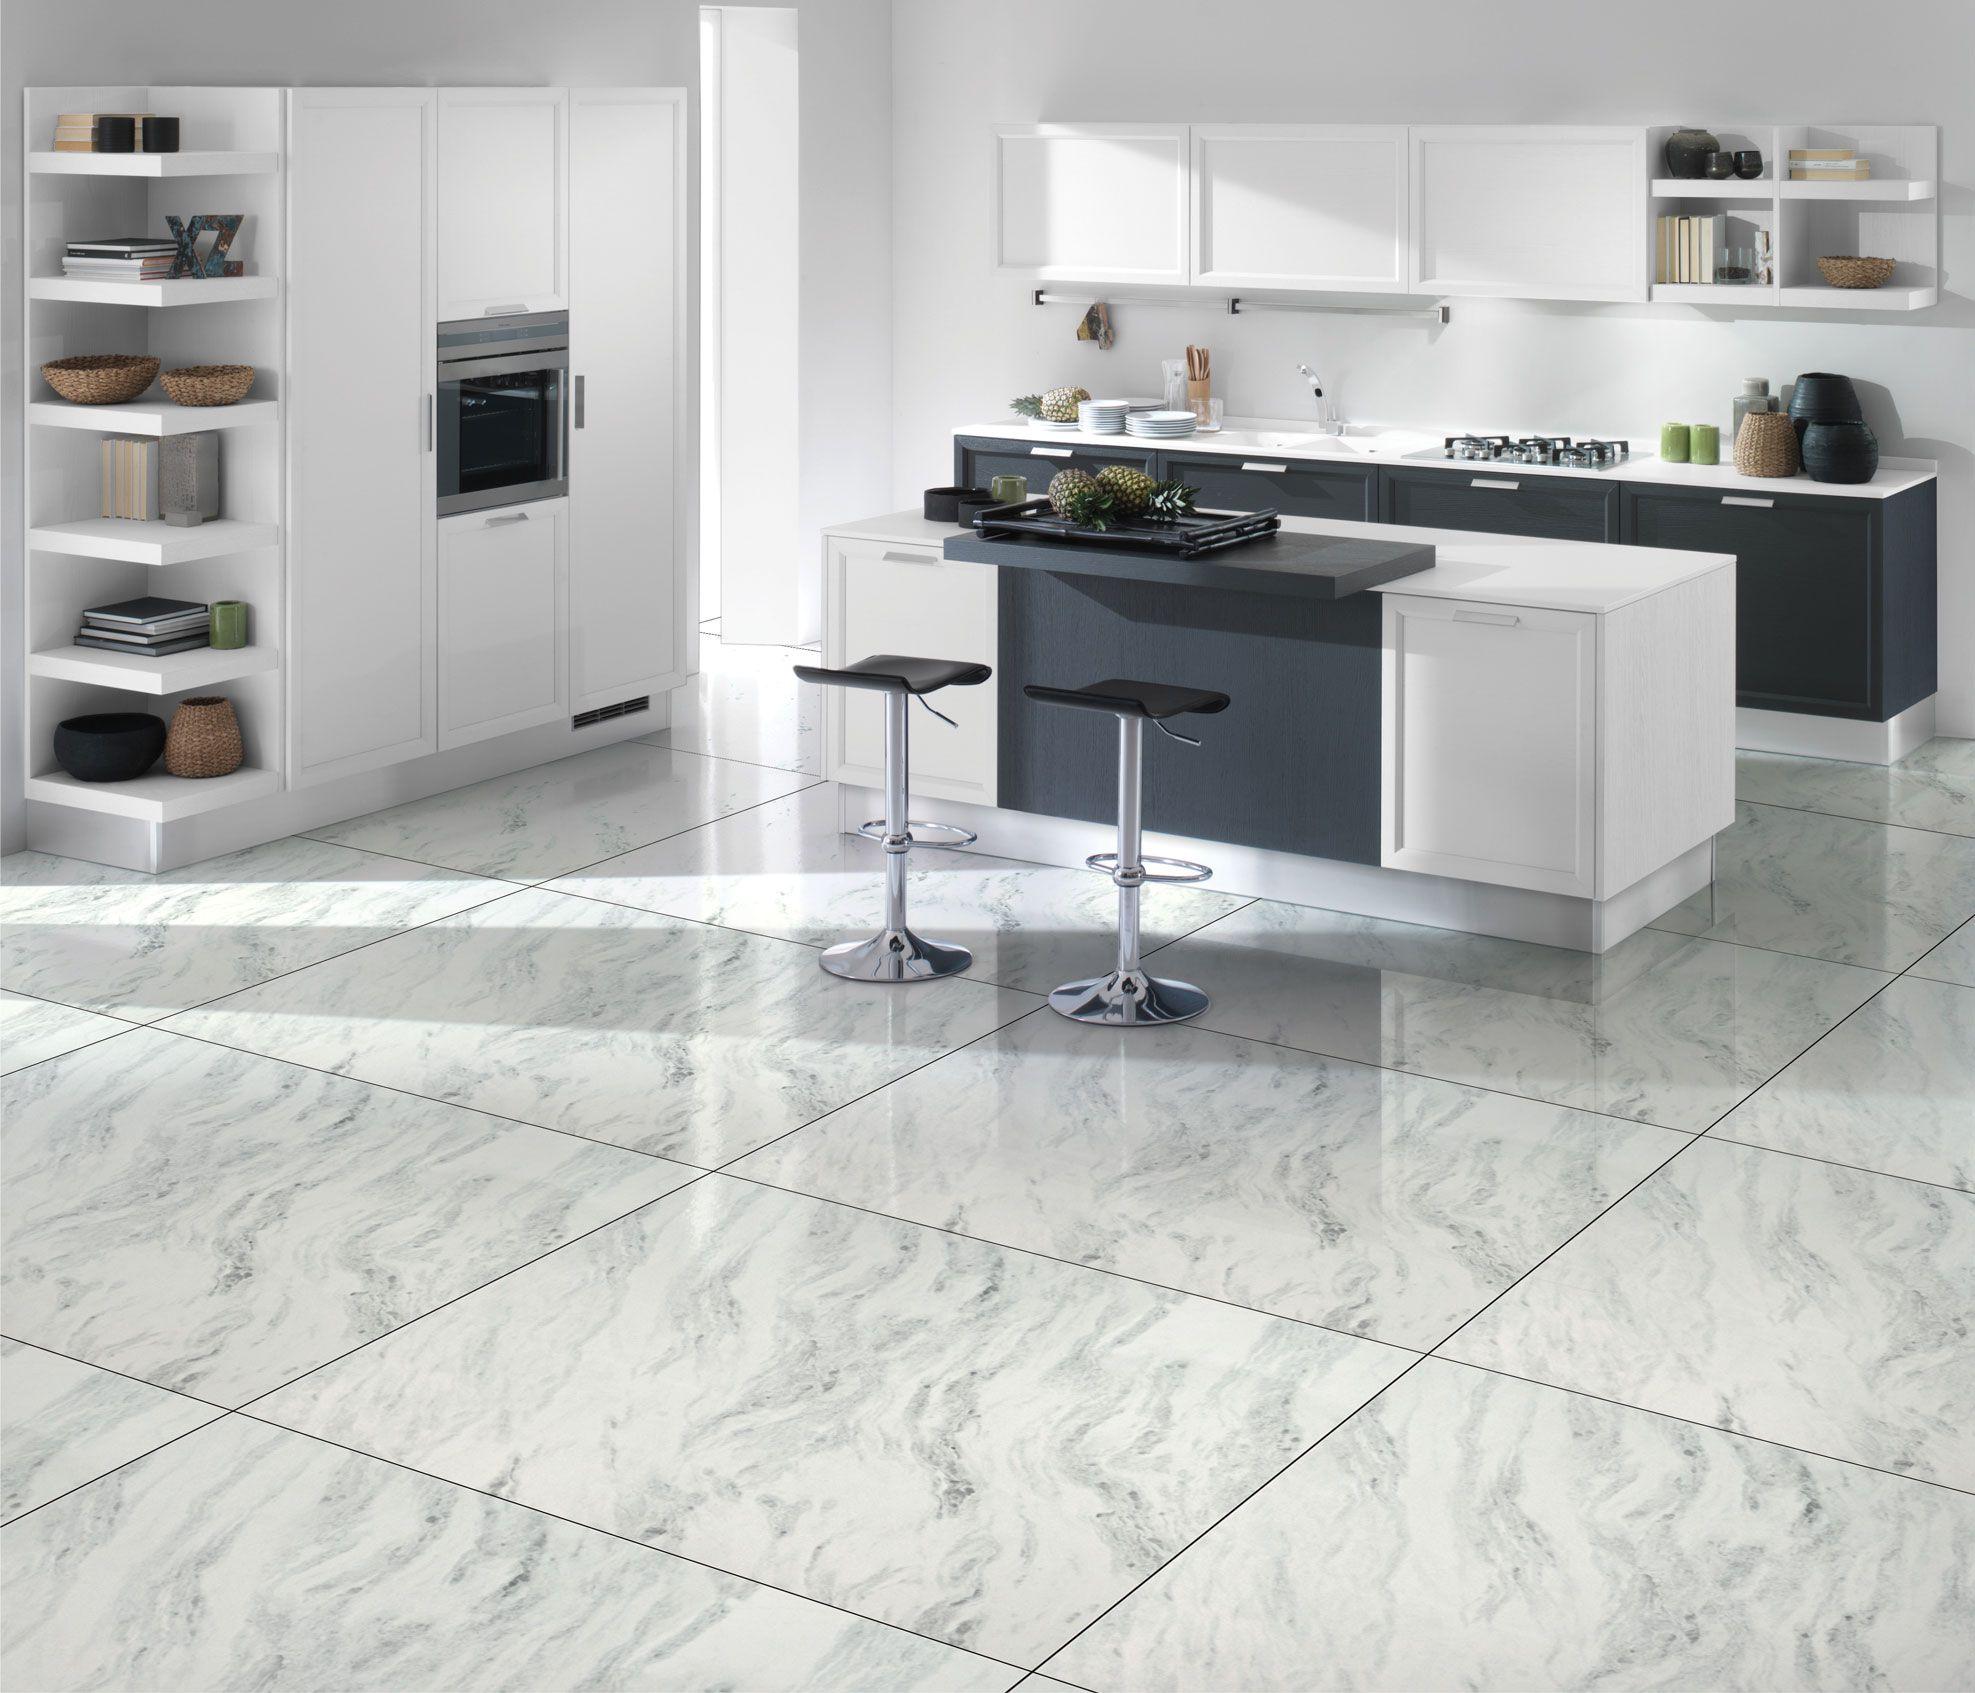 vitrified floor tiles design for living room furniture dark grey sofas buy designer wall bathroom bedroom kitchen office exterior ceramic online